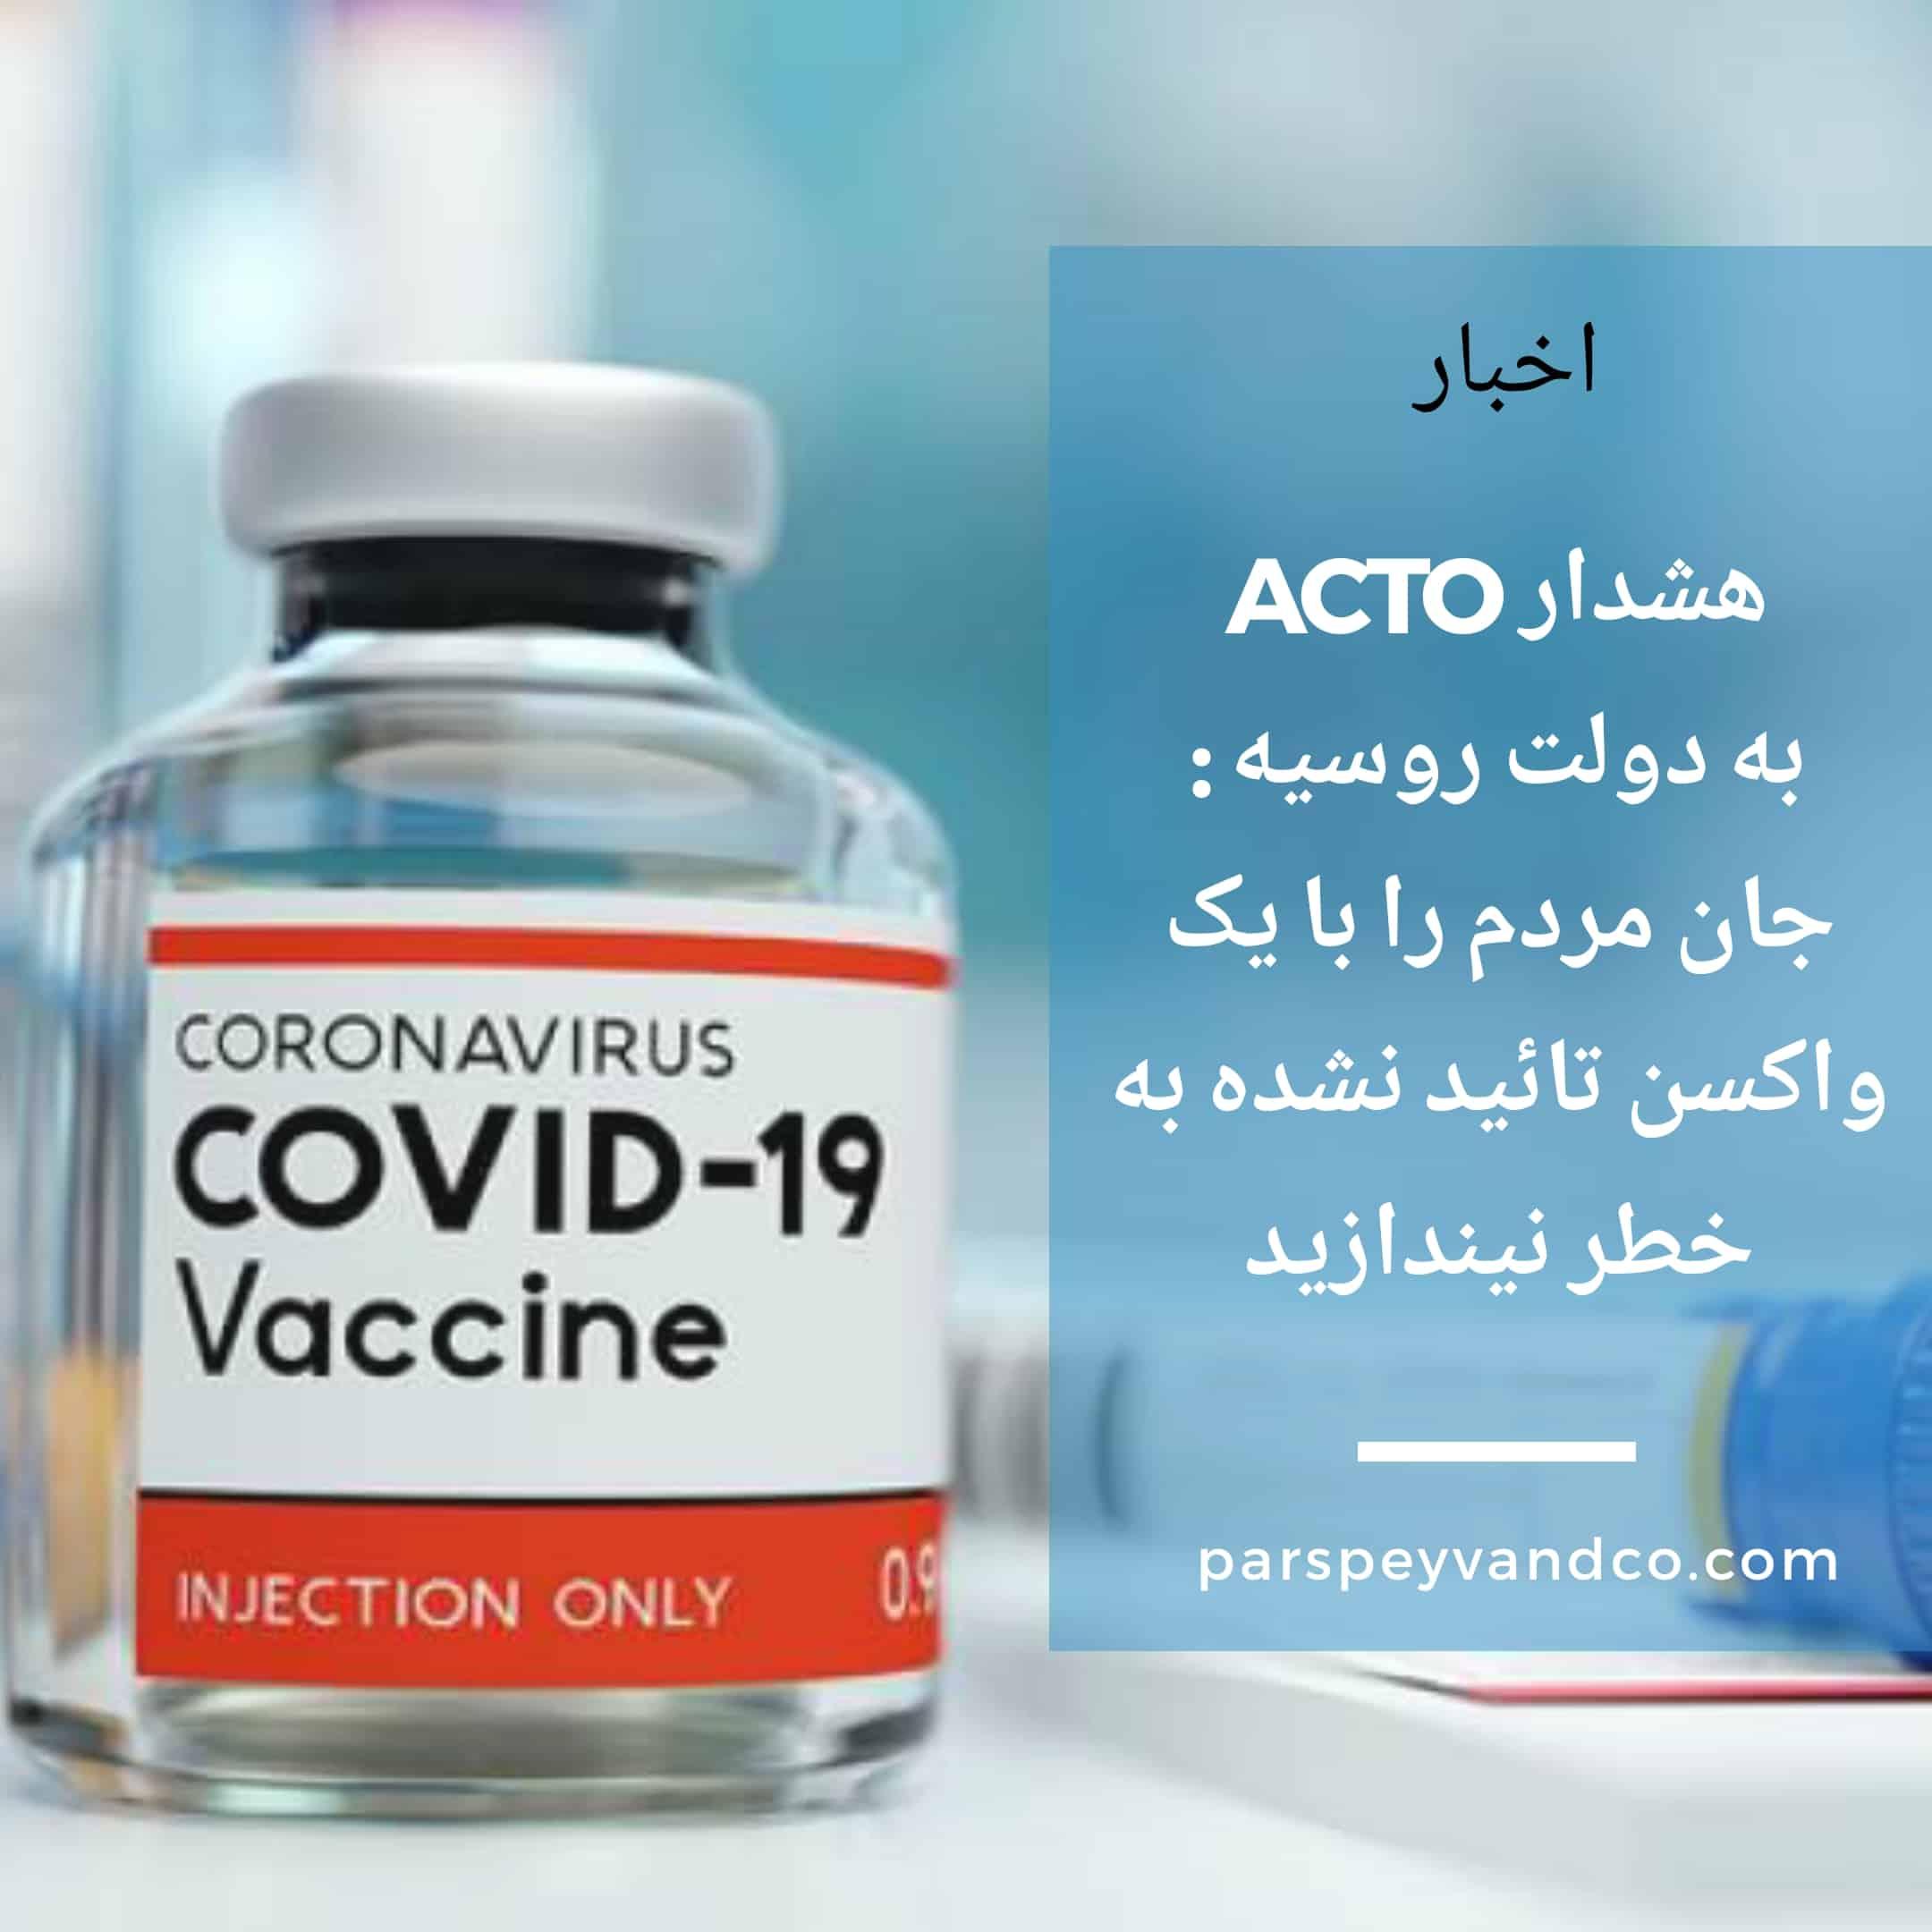 واکسن کرونا ساخت روسیه